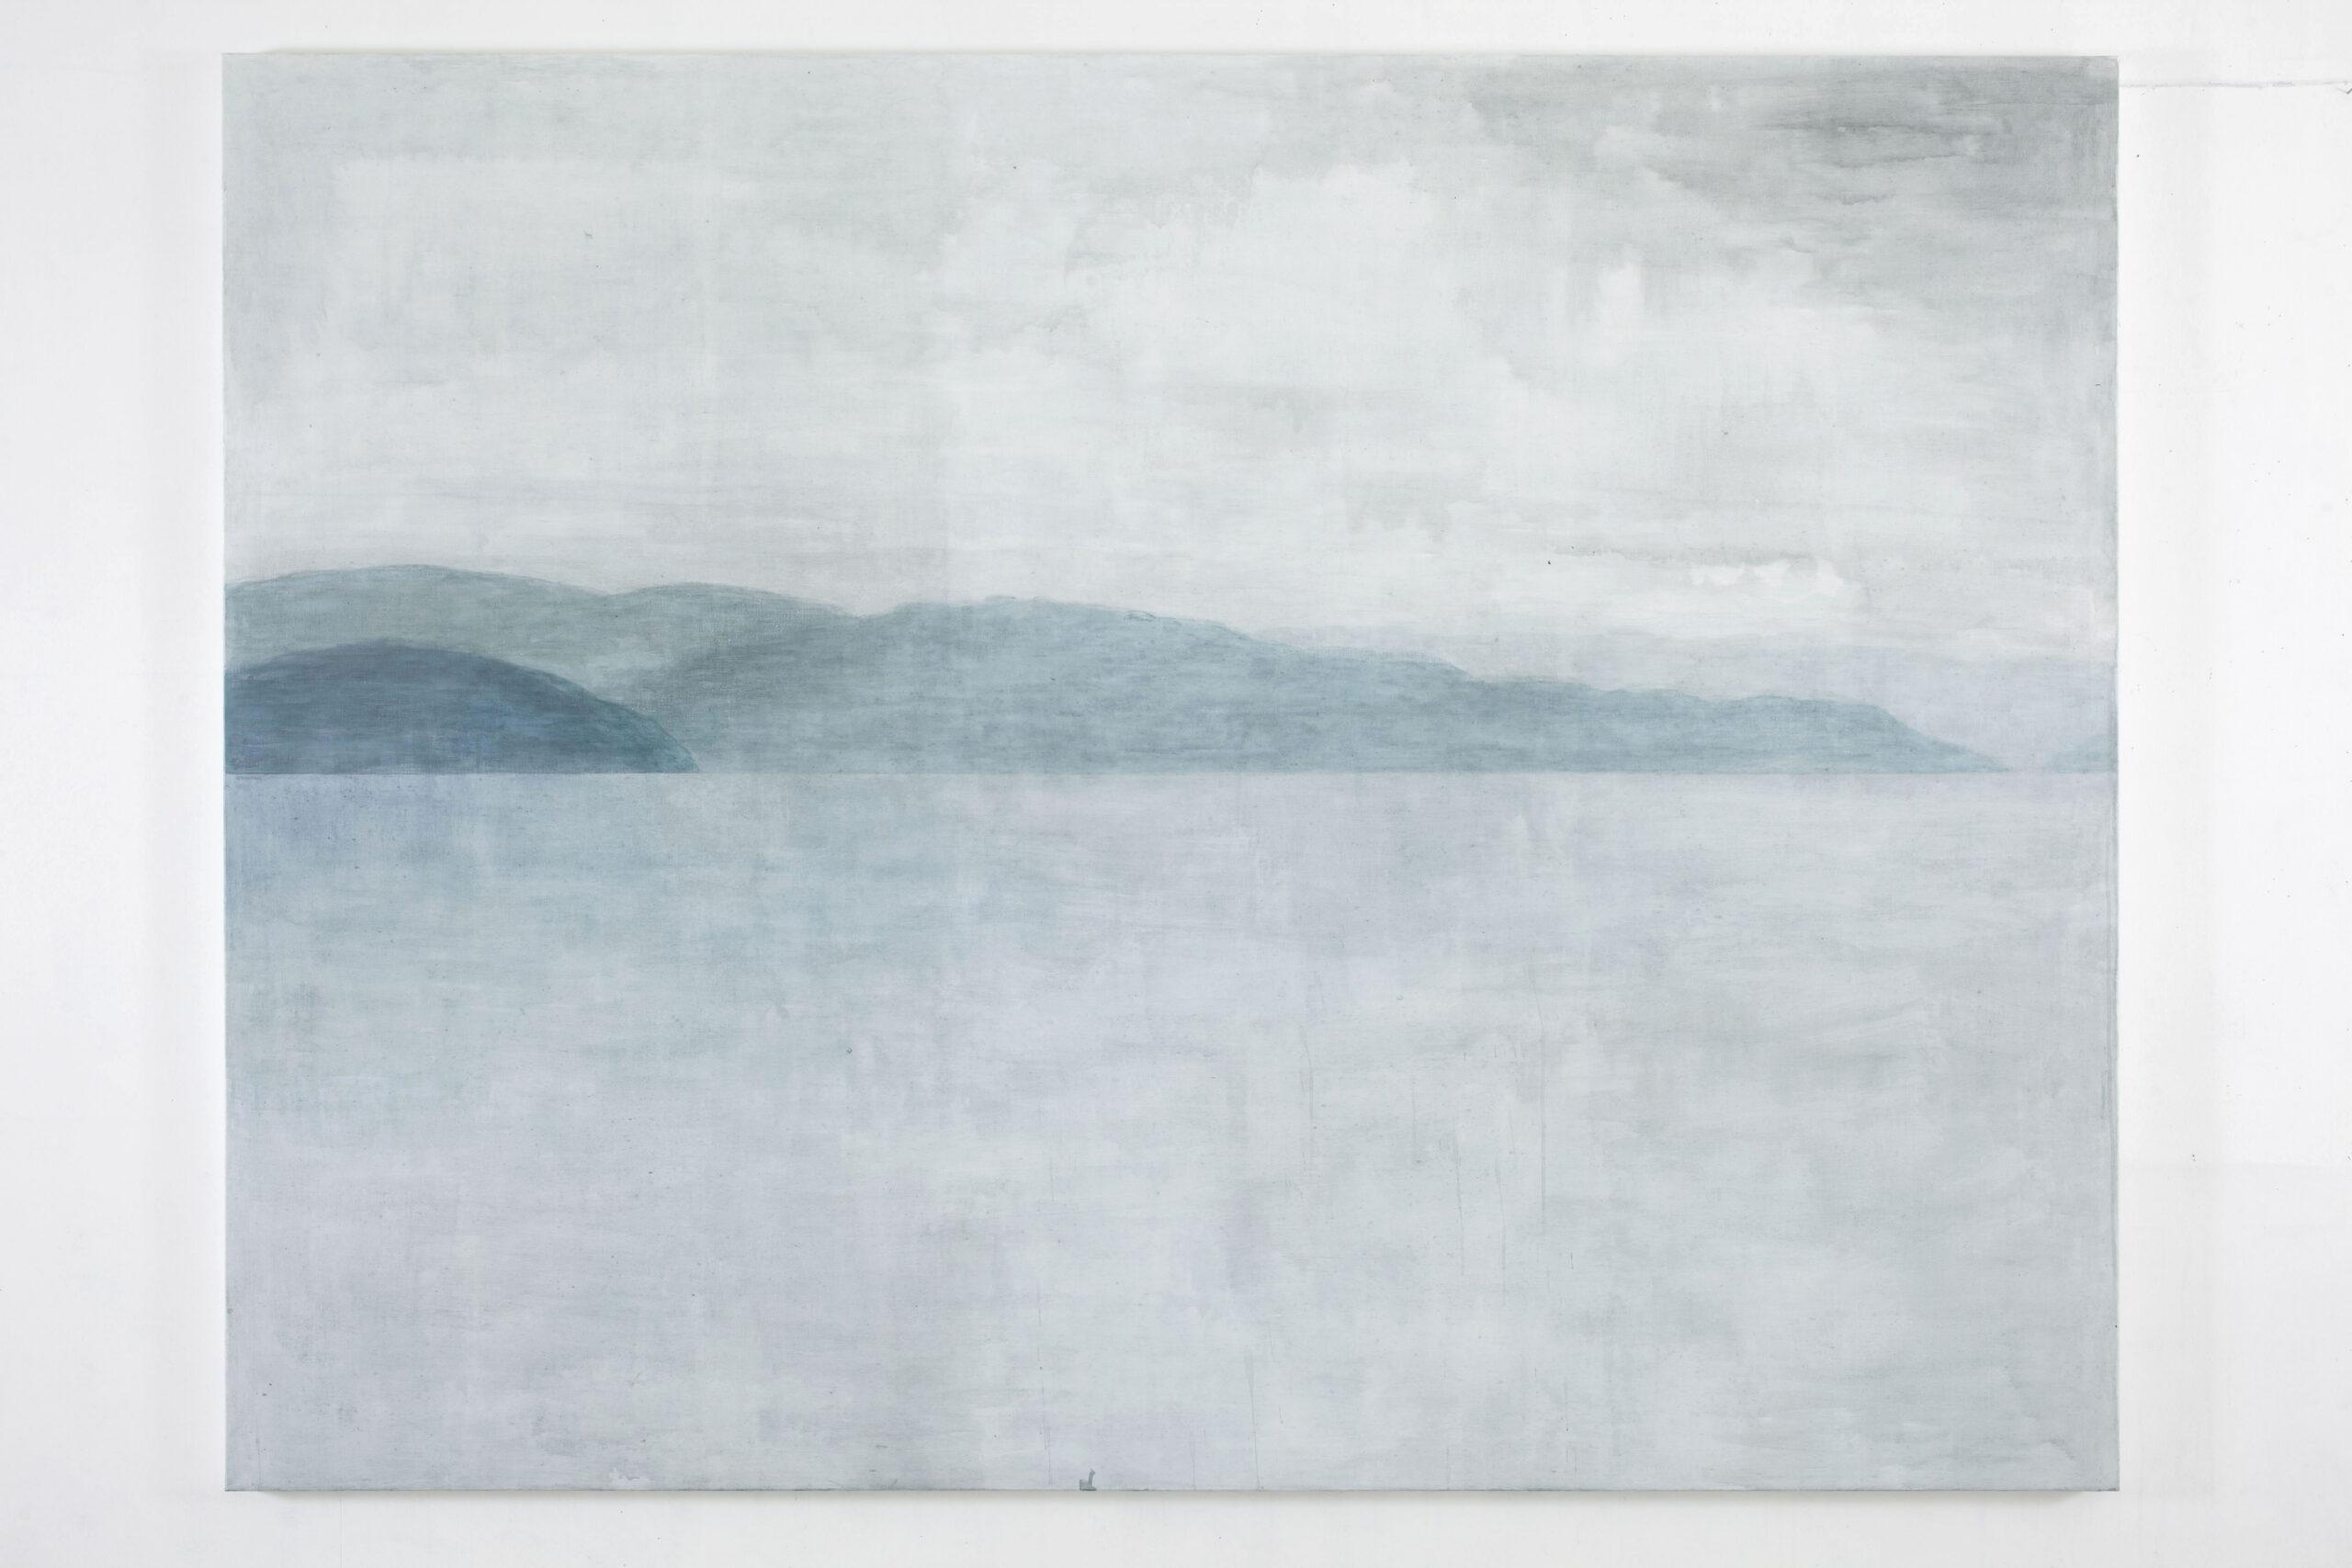 12_Inne-i-fjorden_akryl-pa-lerret_168-x-222-cm-MG_1228-1